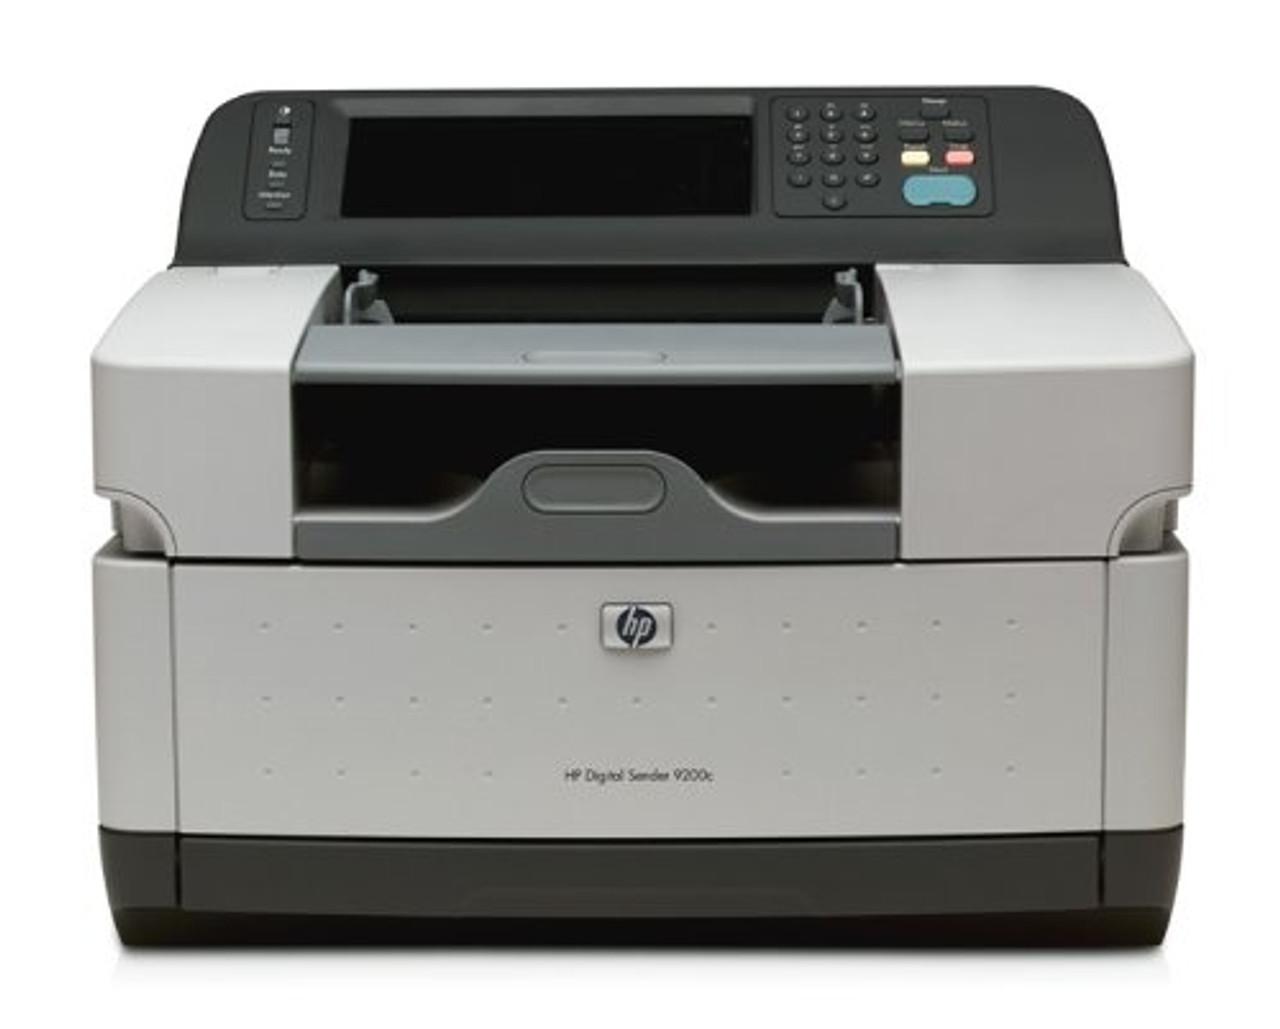 HP Digital Sender 9200c Q5916AR Document scanner